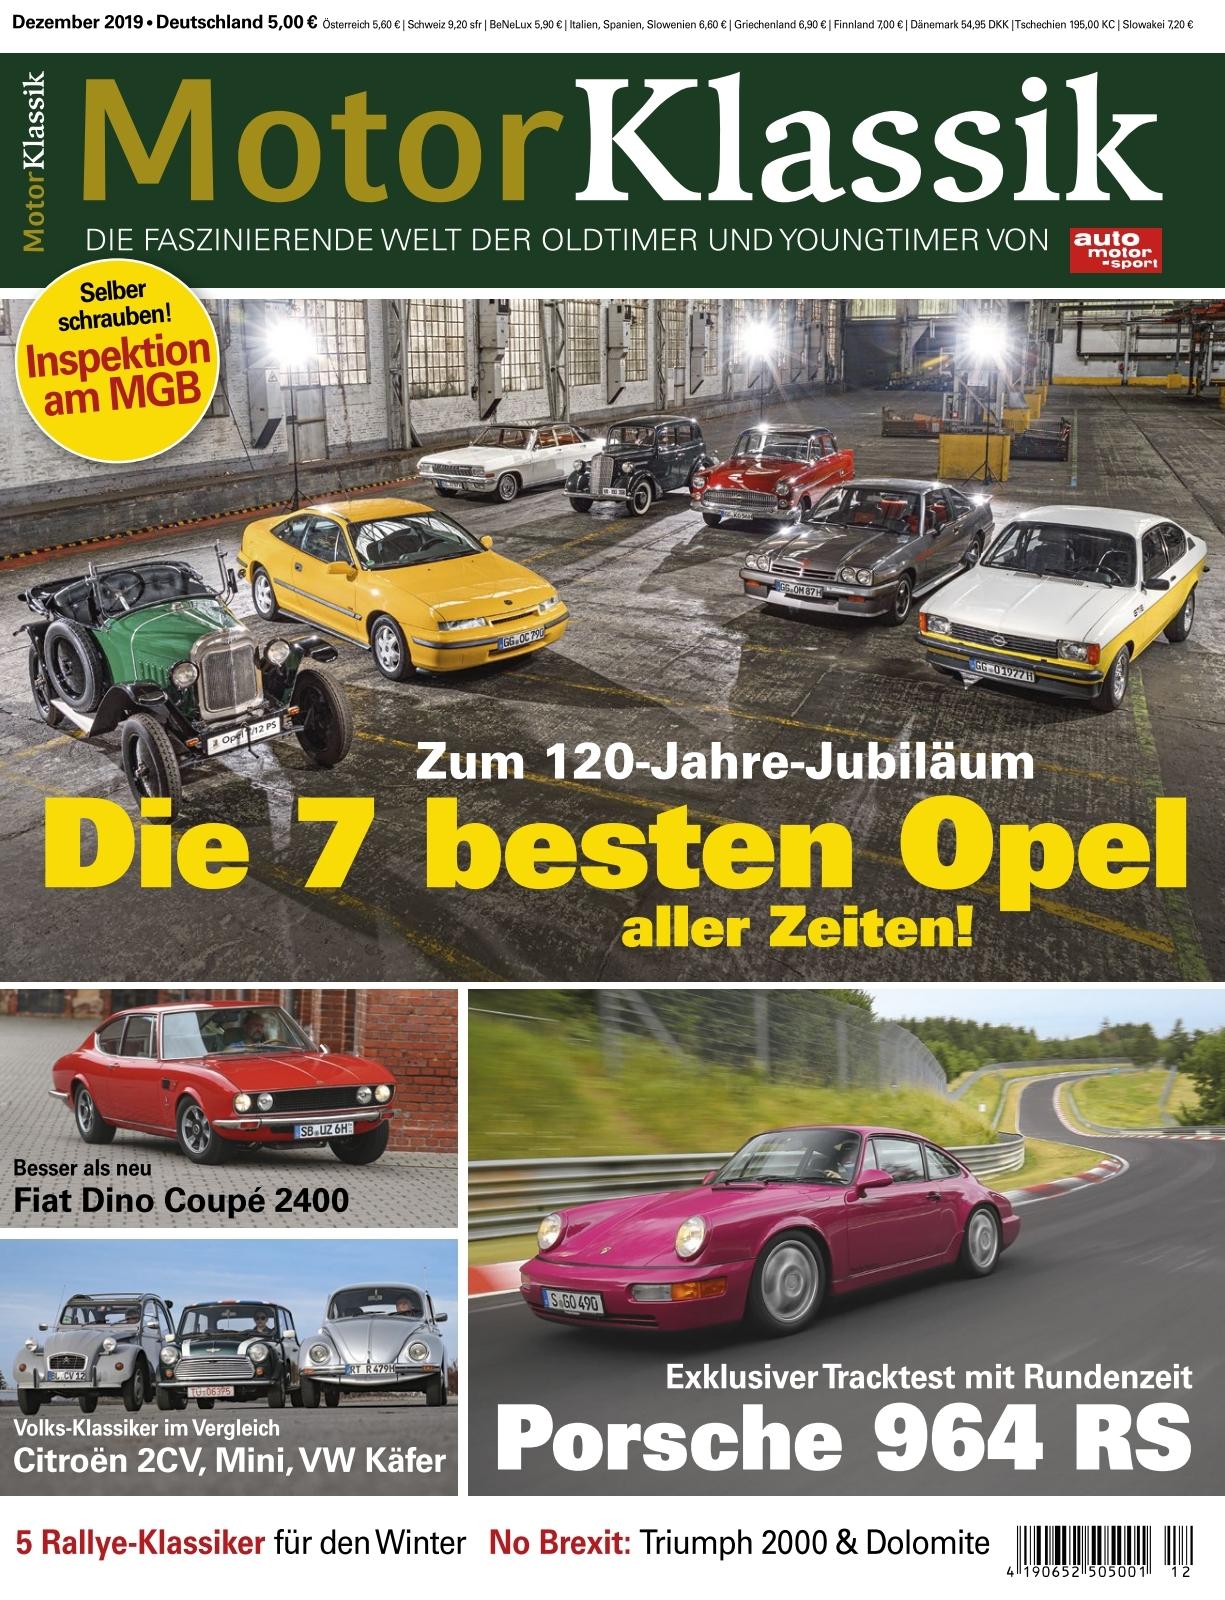 ZIMMERMANN Bremstrommeln Satz VW 1500,1600 KÄFER KARMANN GHIA hinten